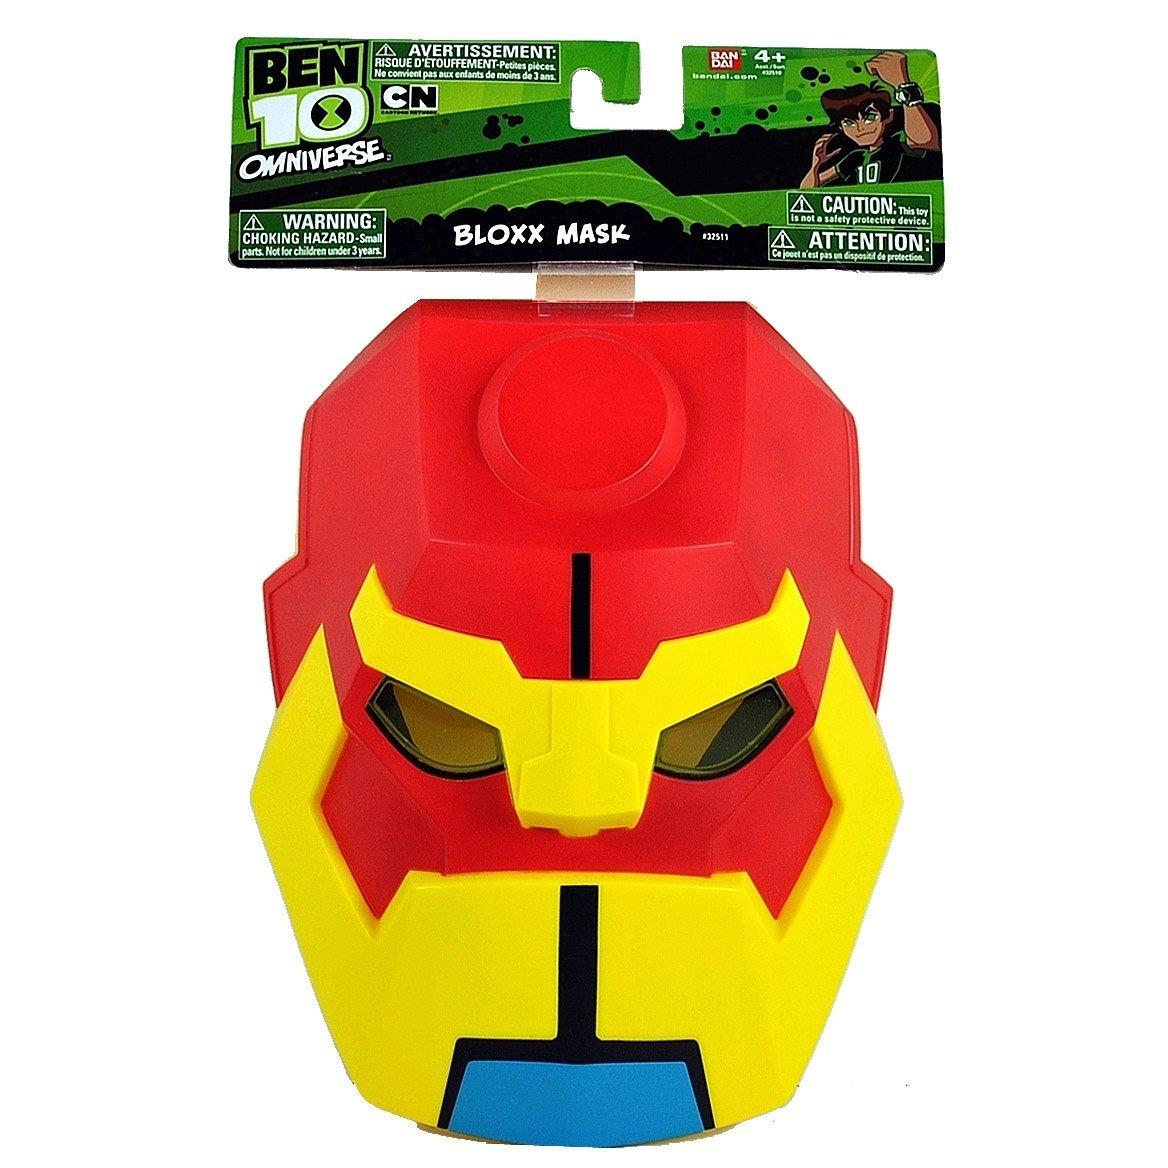 Bandai Year 2013 Ben 10 Omniverse Series Action Figure Mask - BLOXX